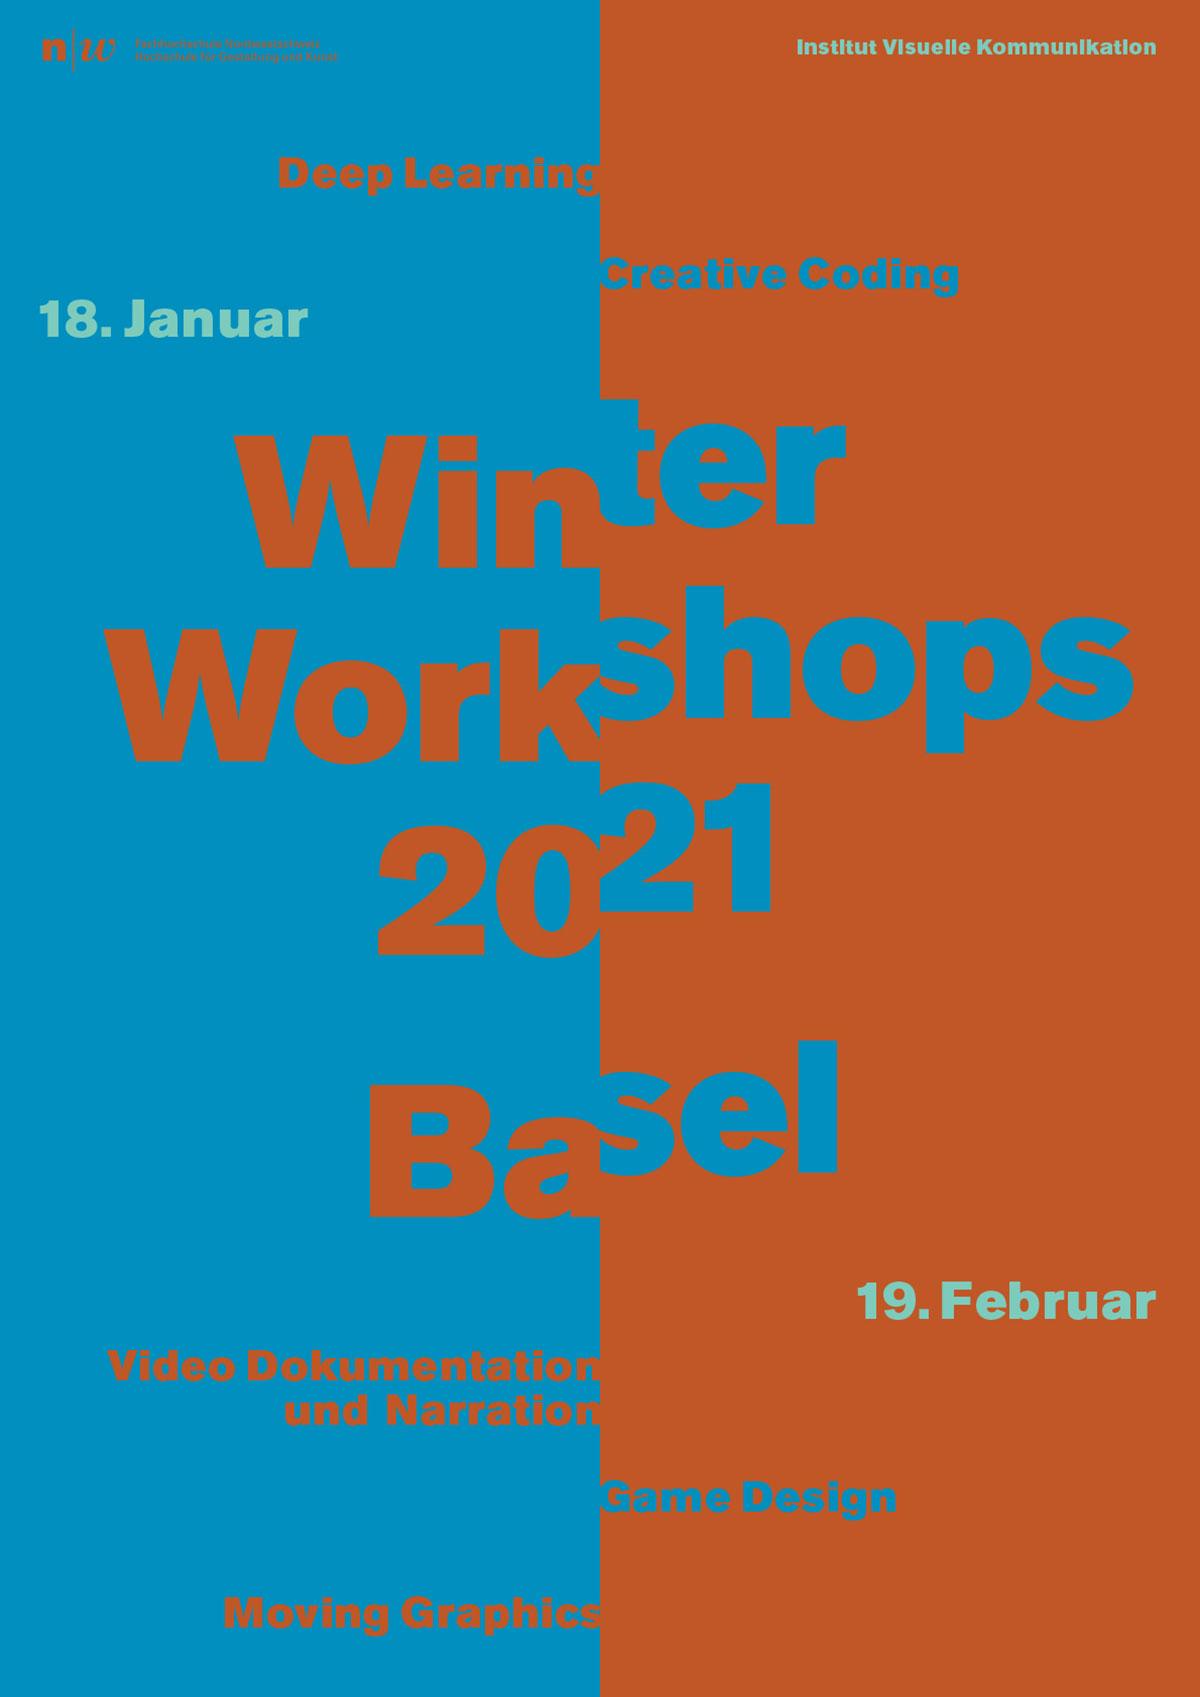 Winter Workshops 2021